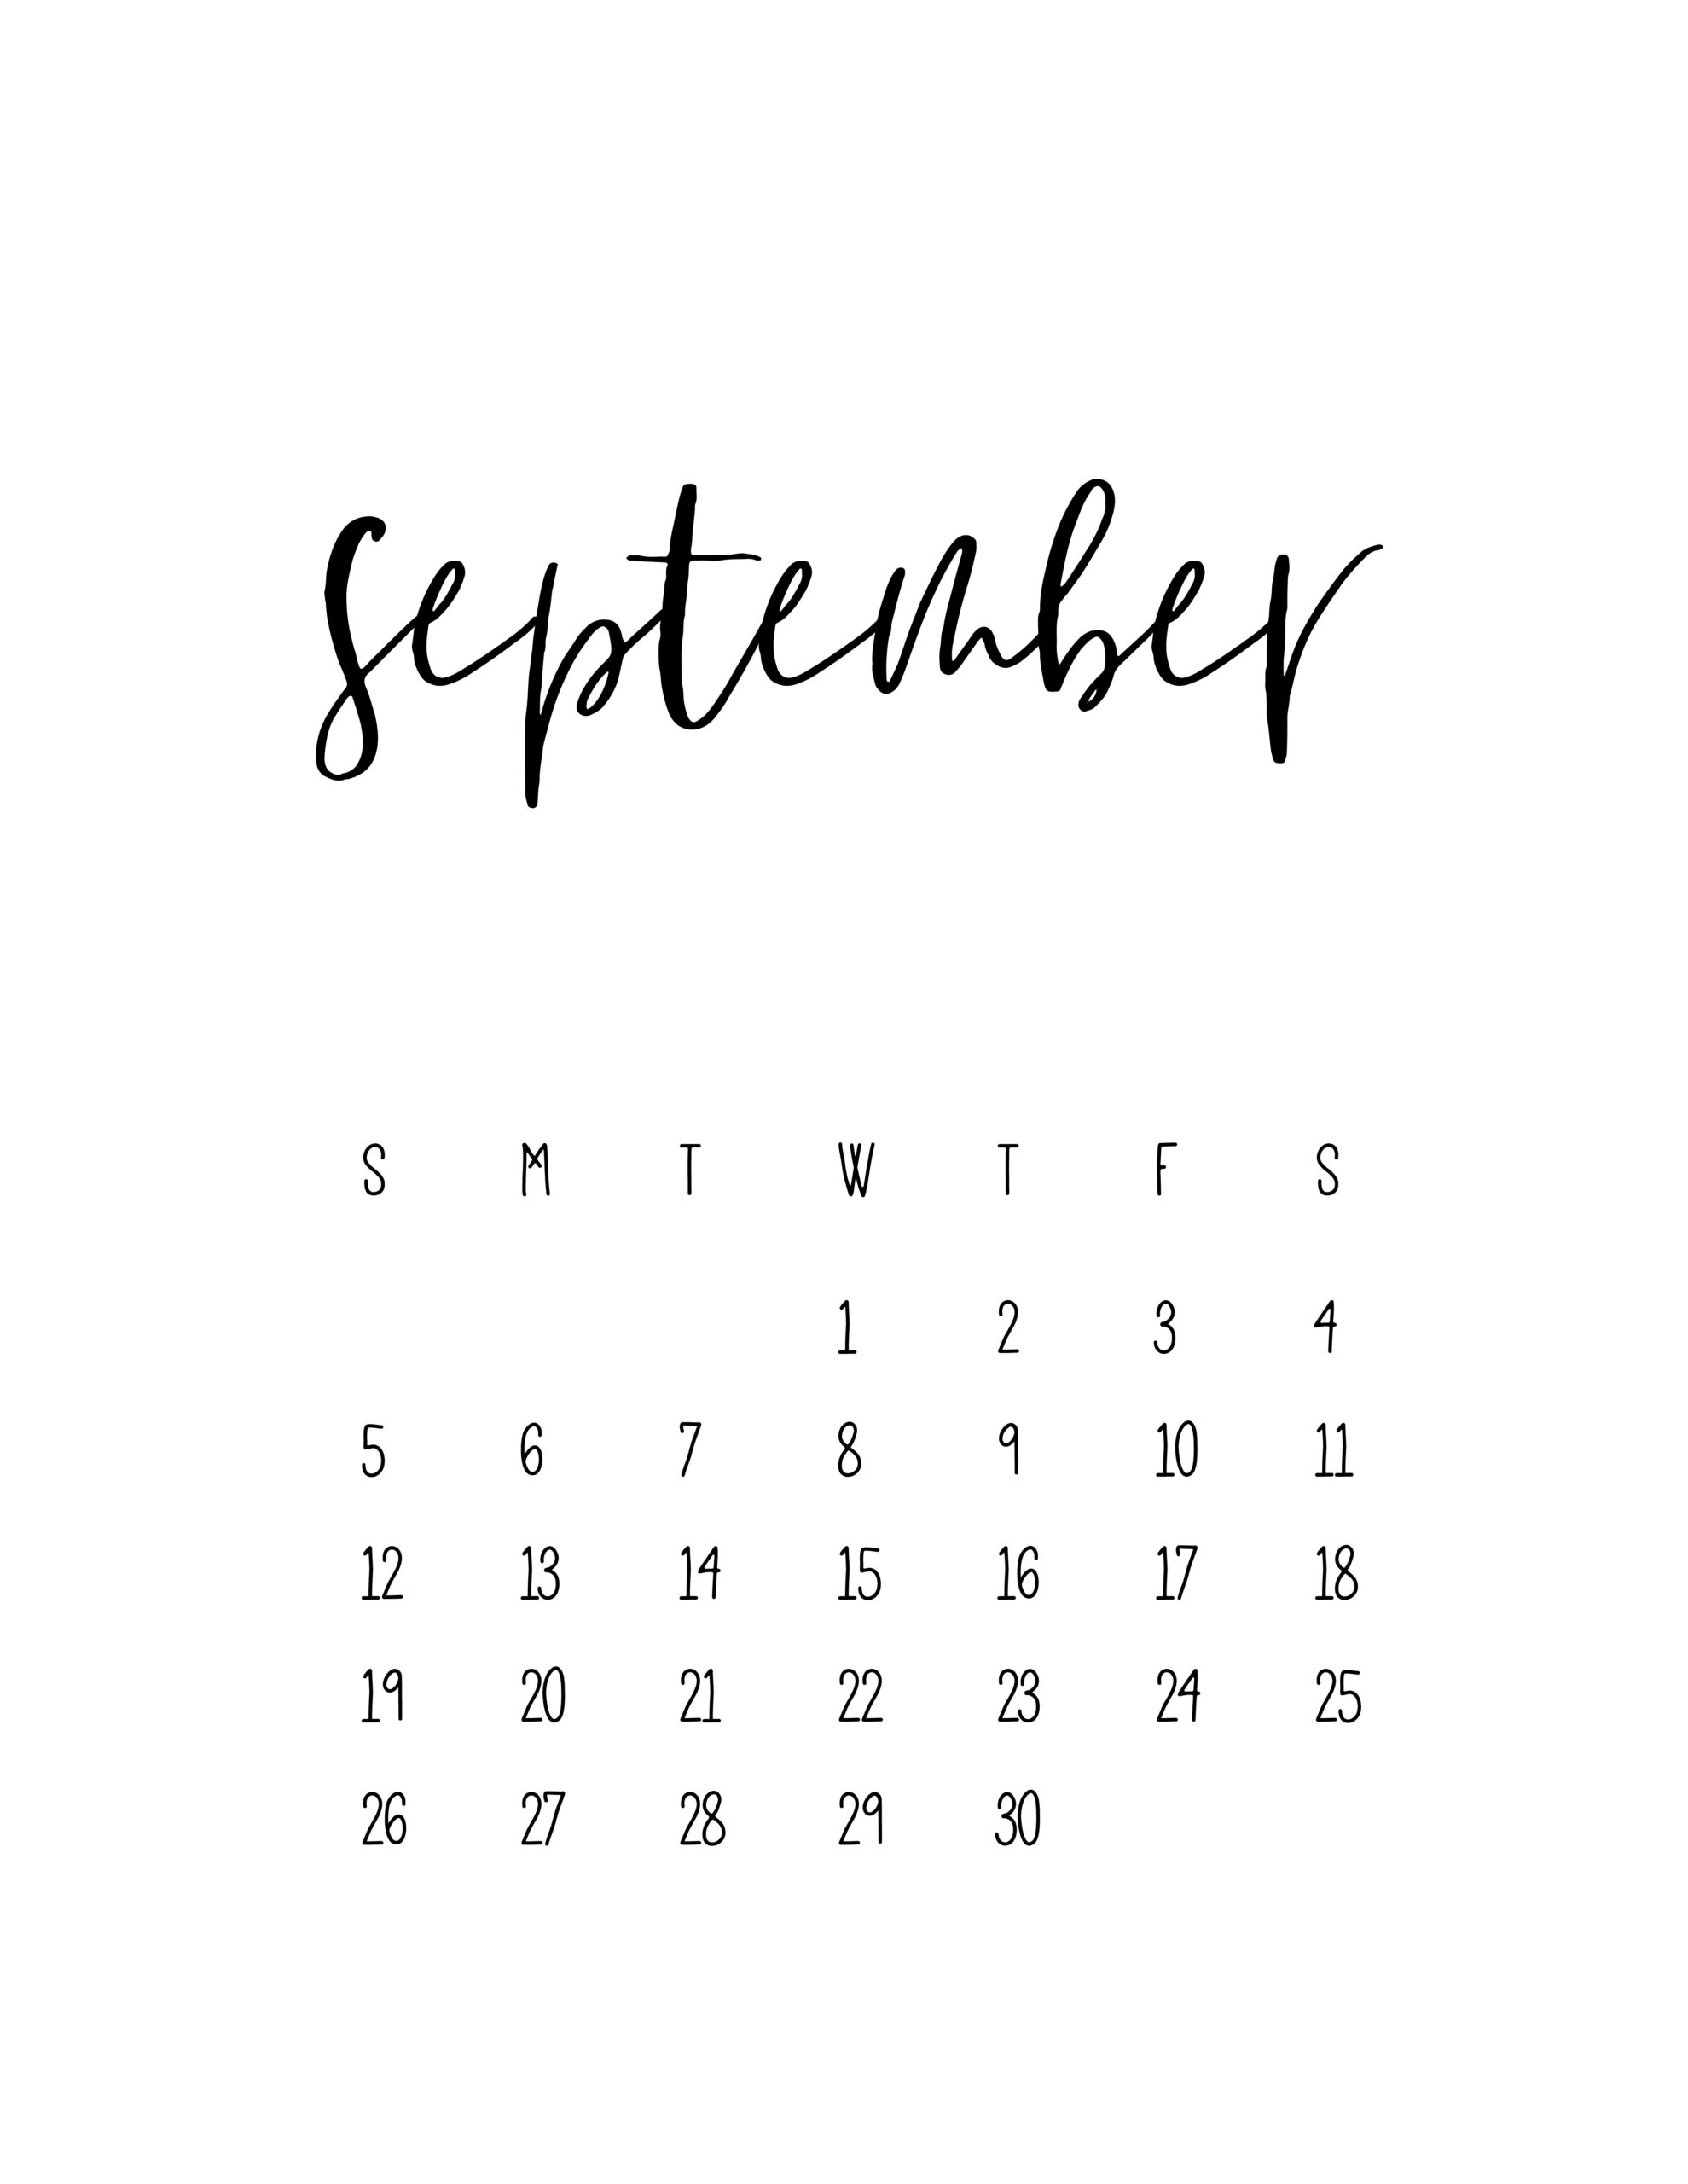 2021 Calendar Free Printable Template - World Of Printables Printable September 2021 Calendar